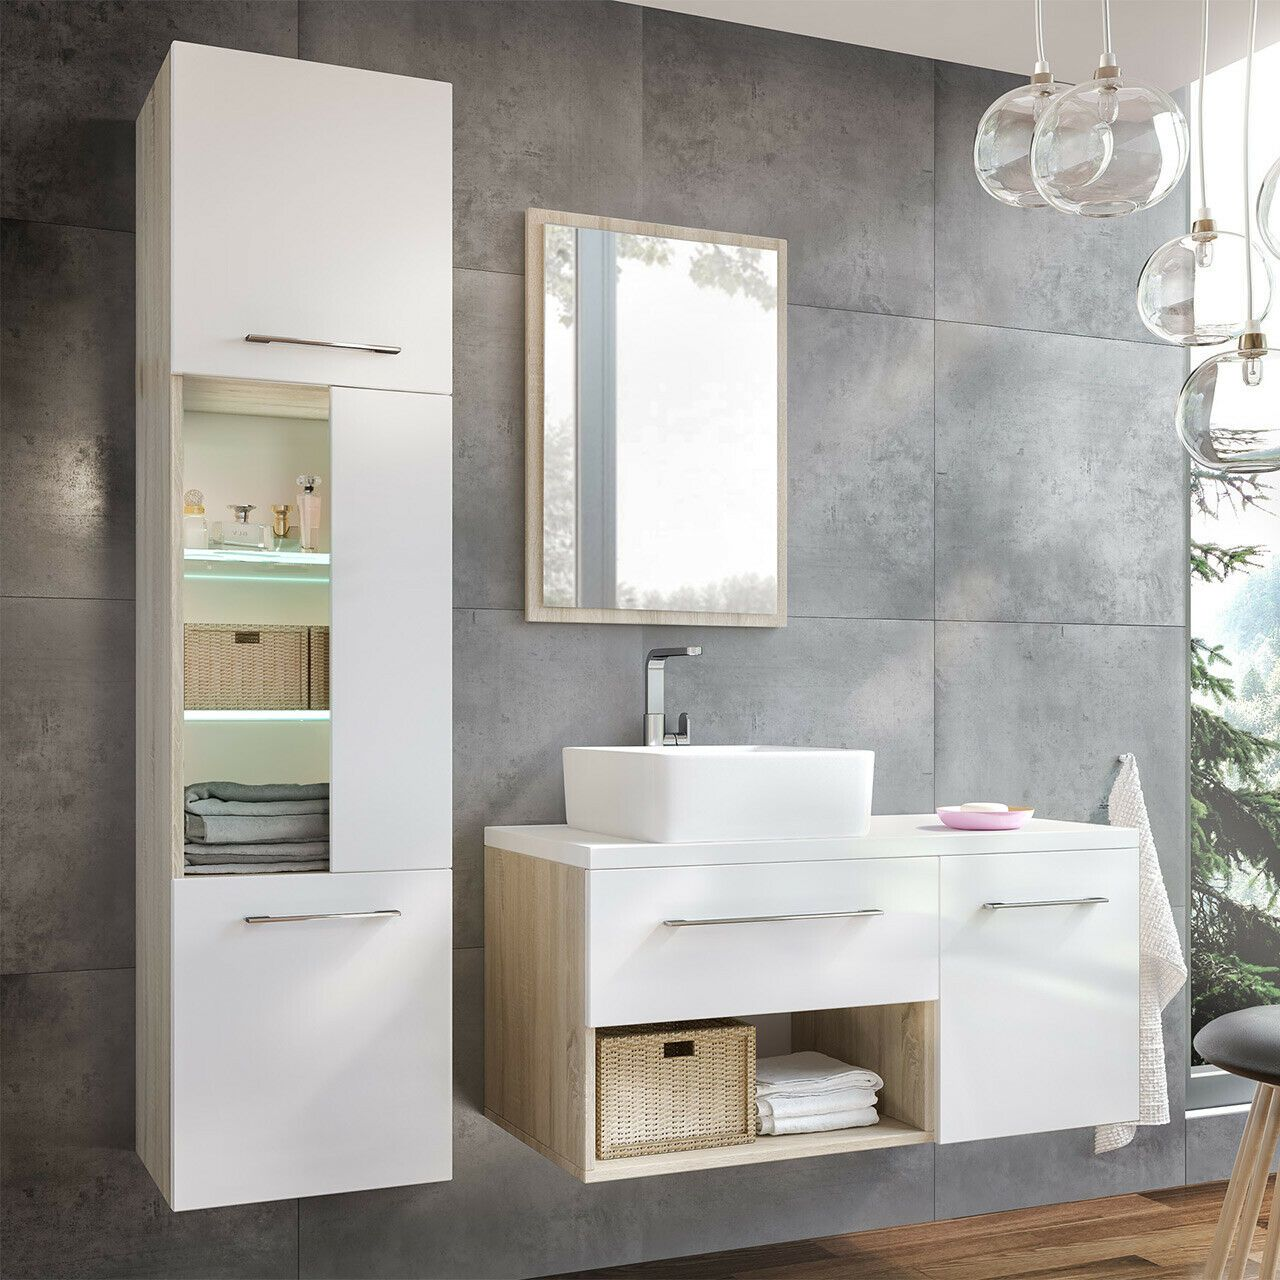 Badmobel Set Aruba Ii Modern Stil Kollektion Waschbecken Badezimmer Mobel Set In 2020 Badezimmer Mobel Waschbecken Badezimmer M